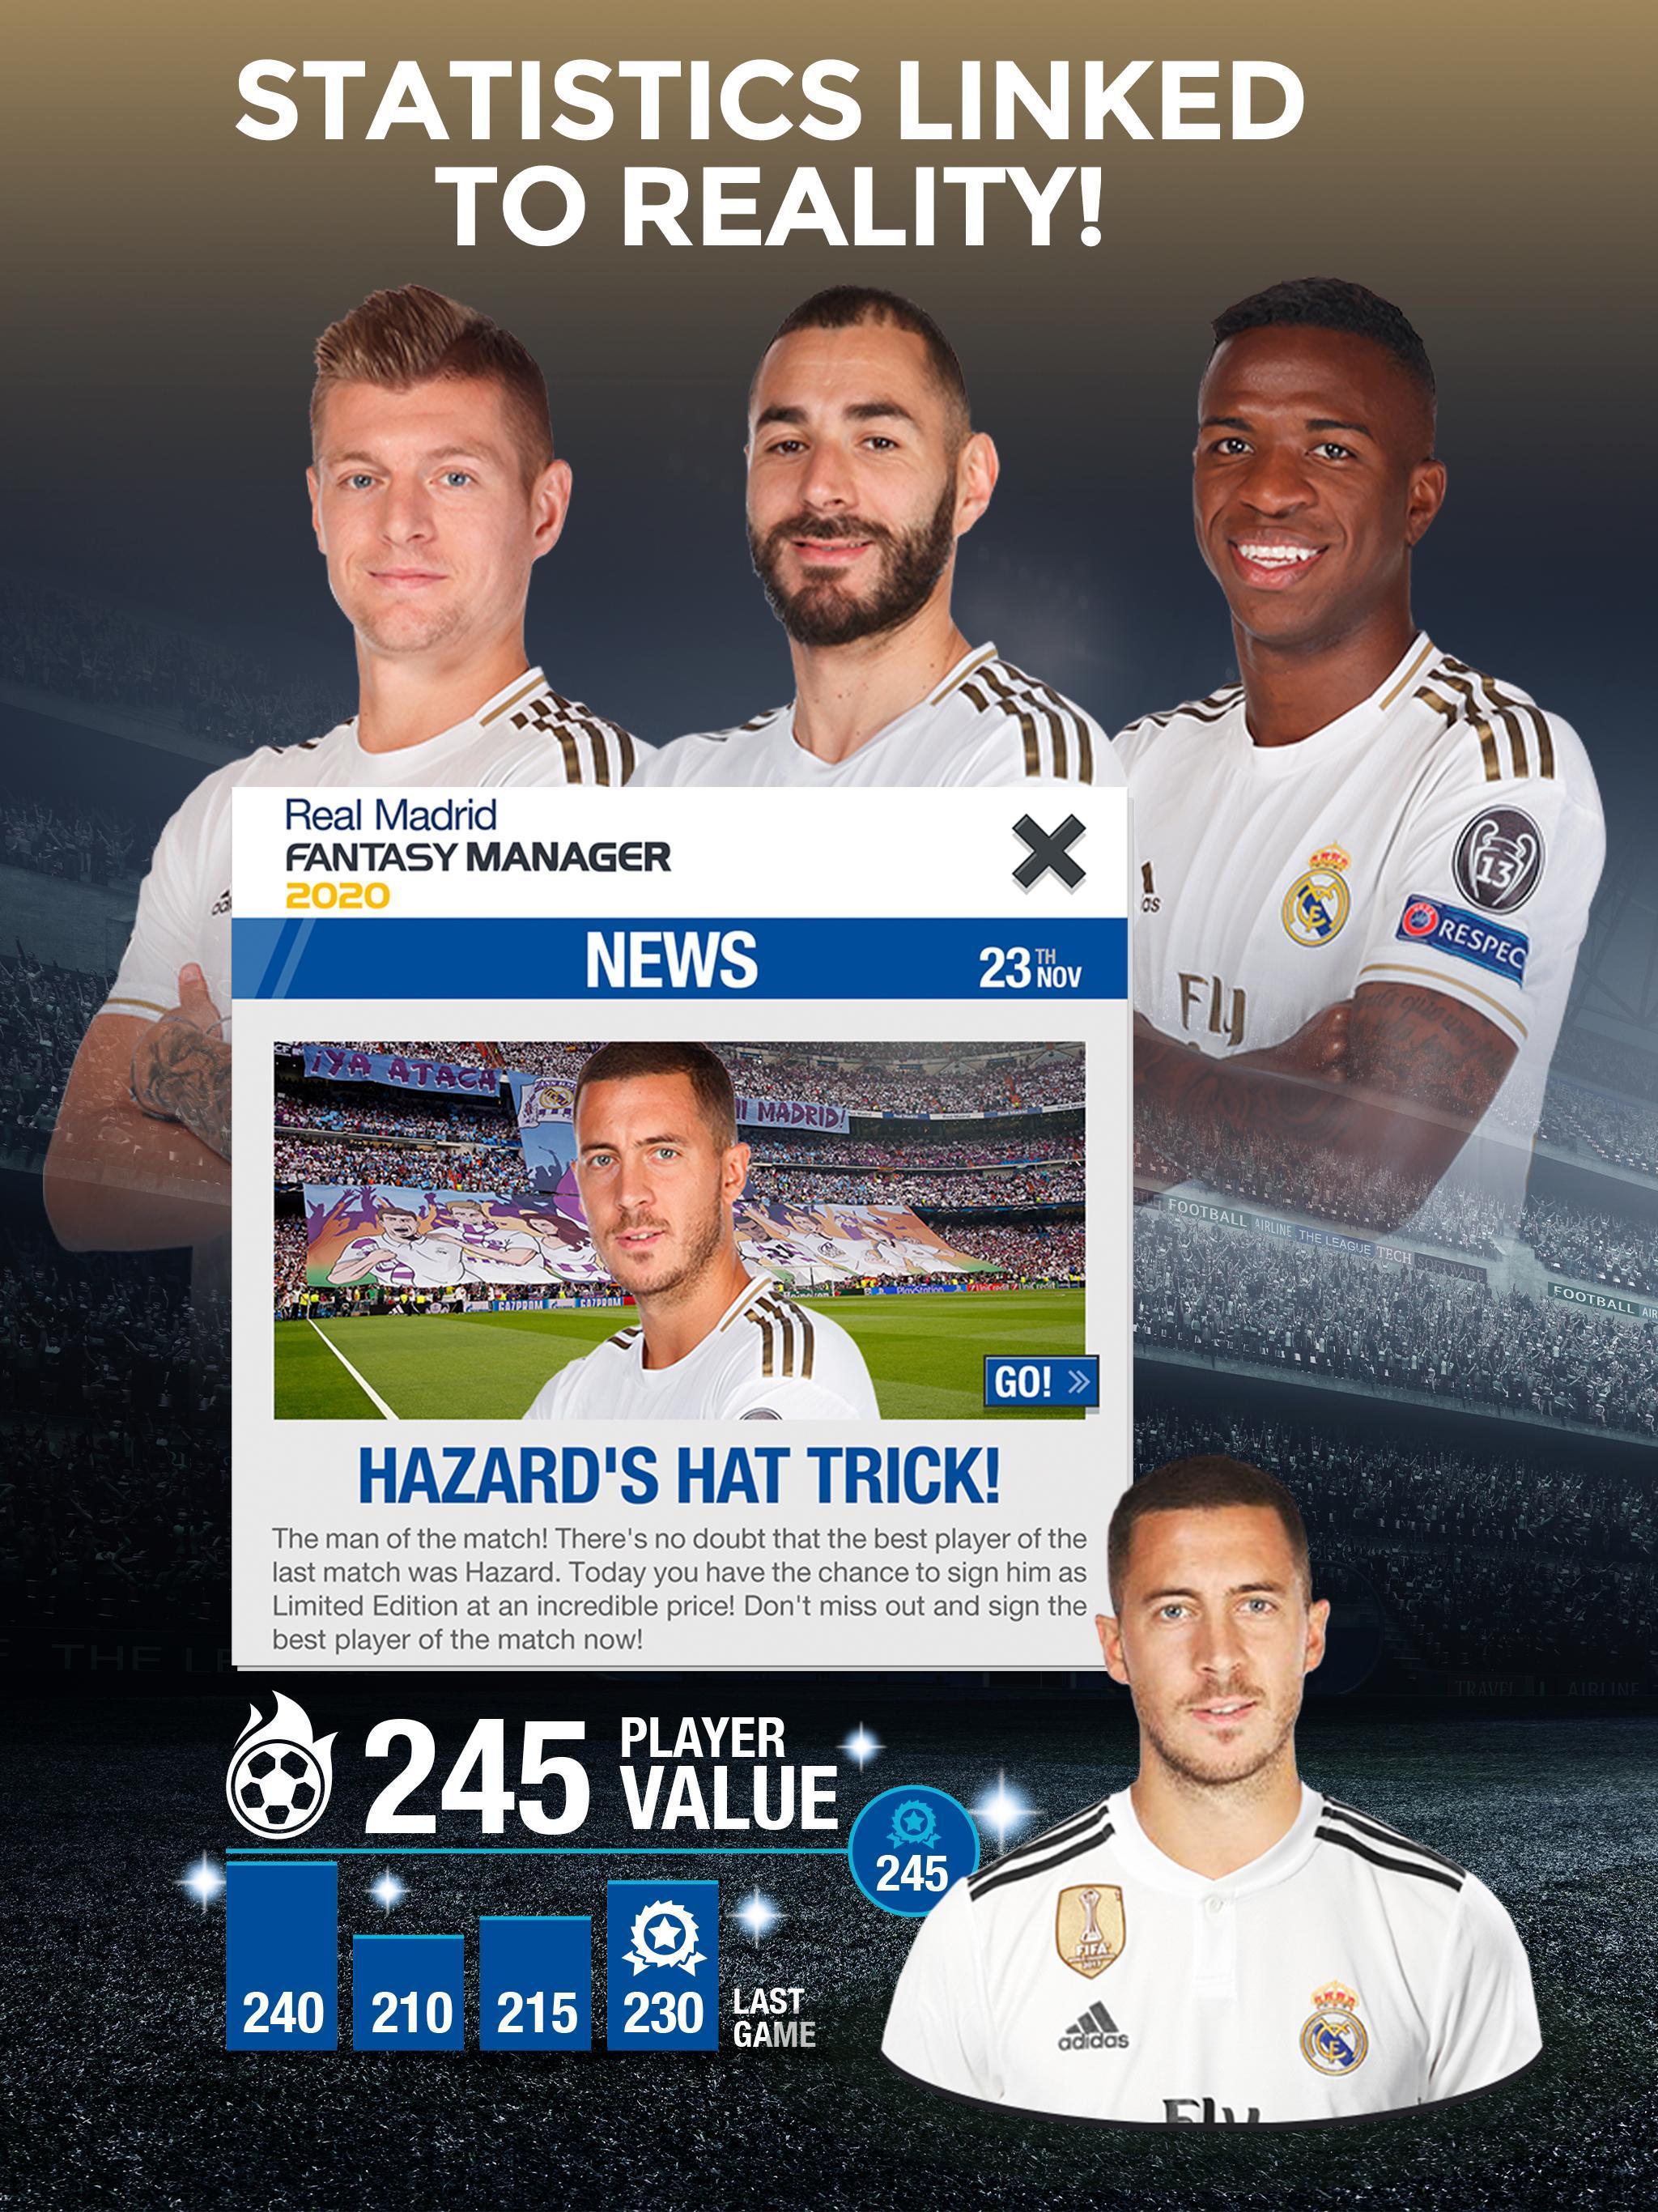 Real Madrid Fantasy Manager'20 Real football live 8 تصوير الشاشة